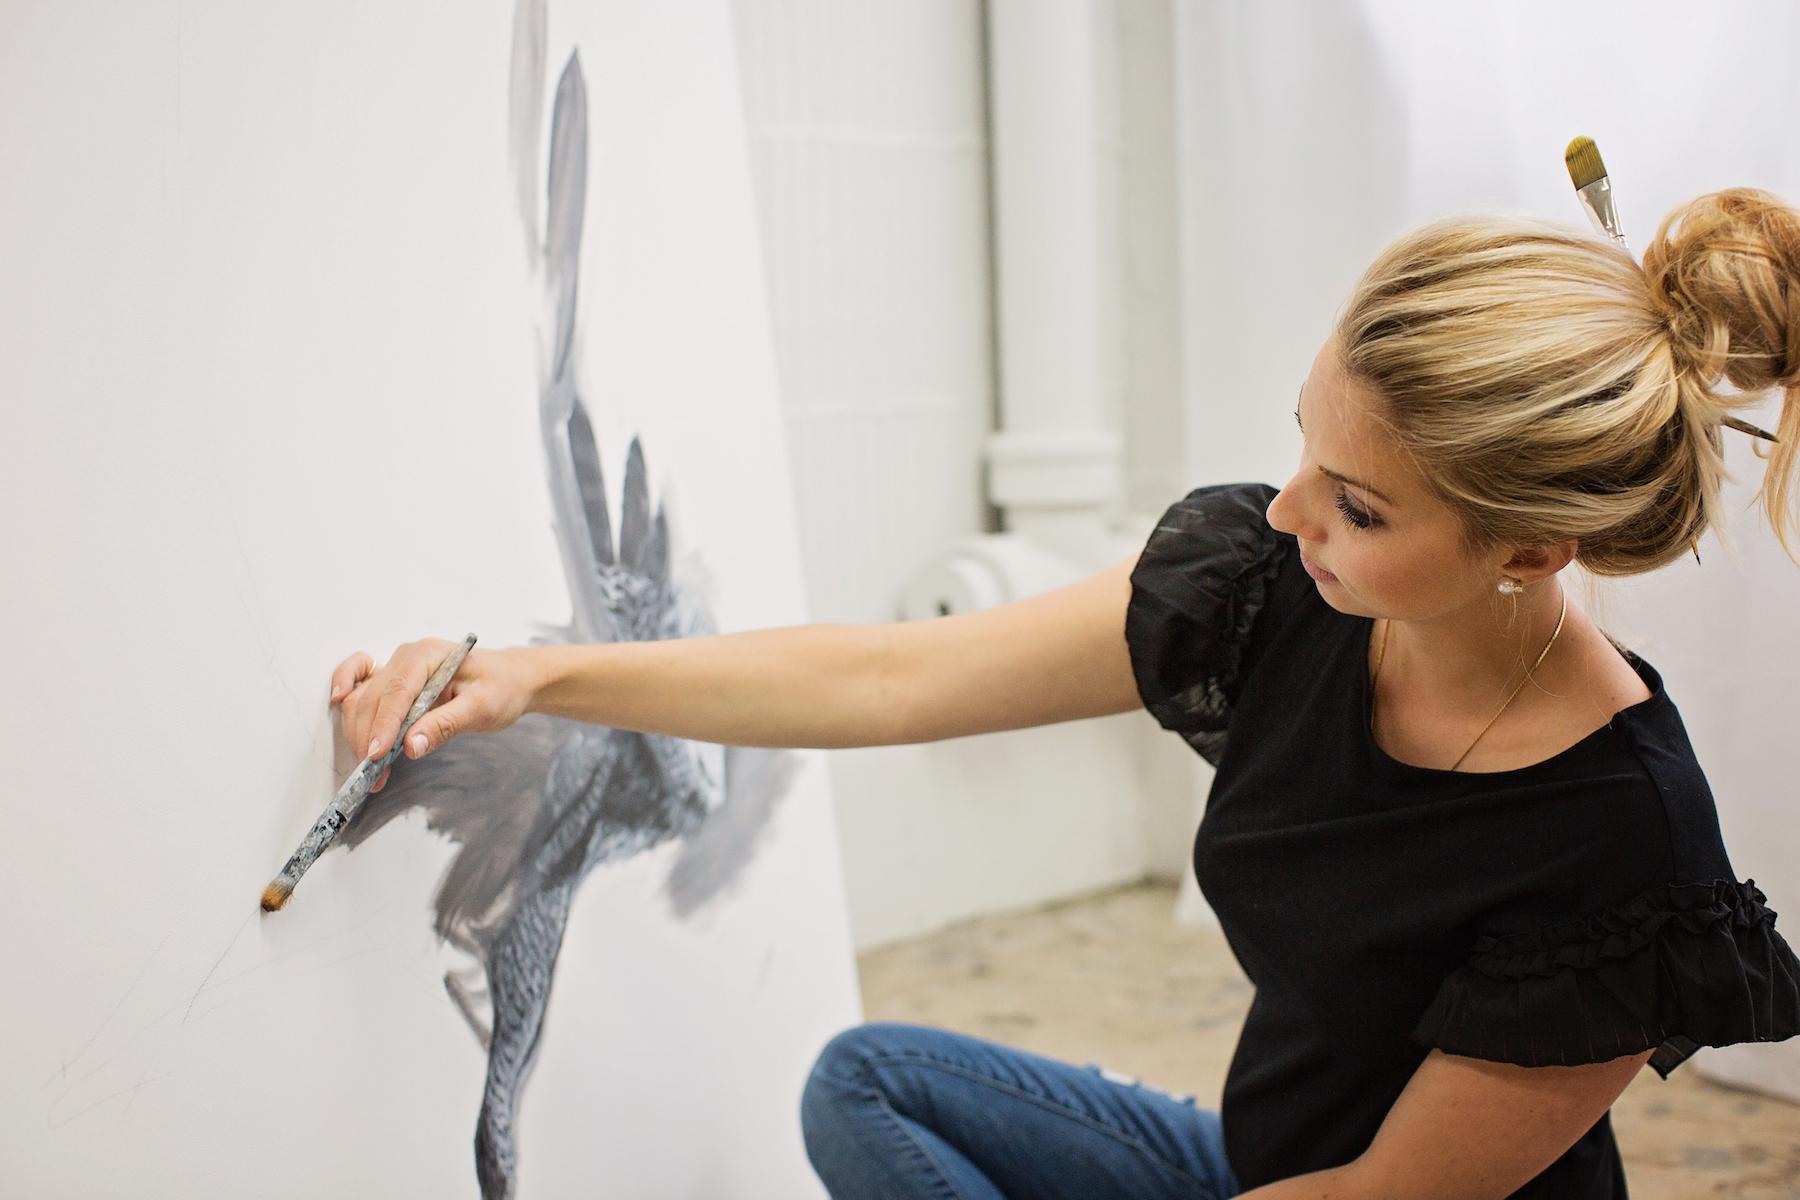 Aliarmstrong wildlife artist